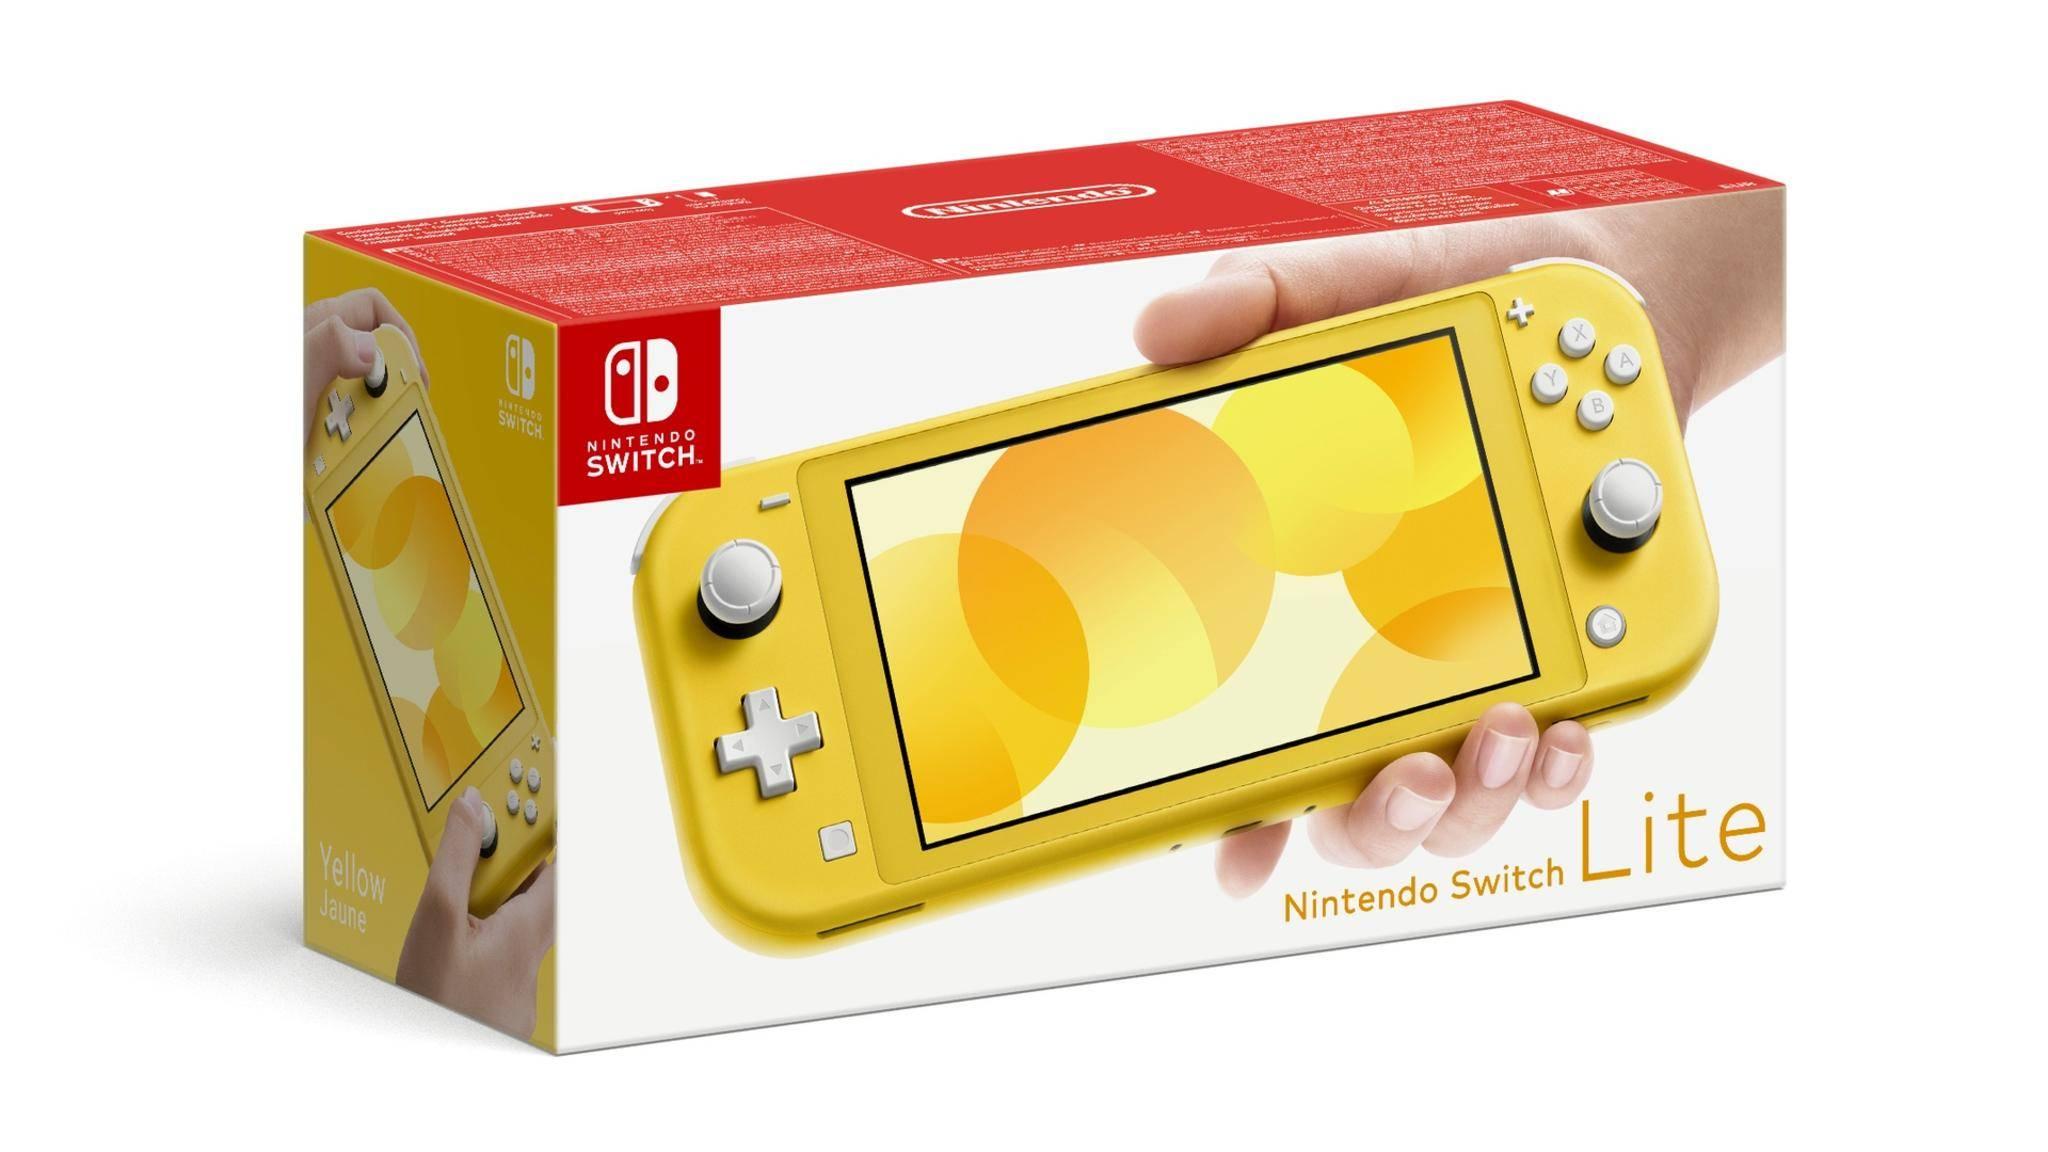 nintendo-switch-lite-gelb-packshot